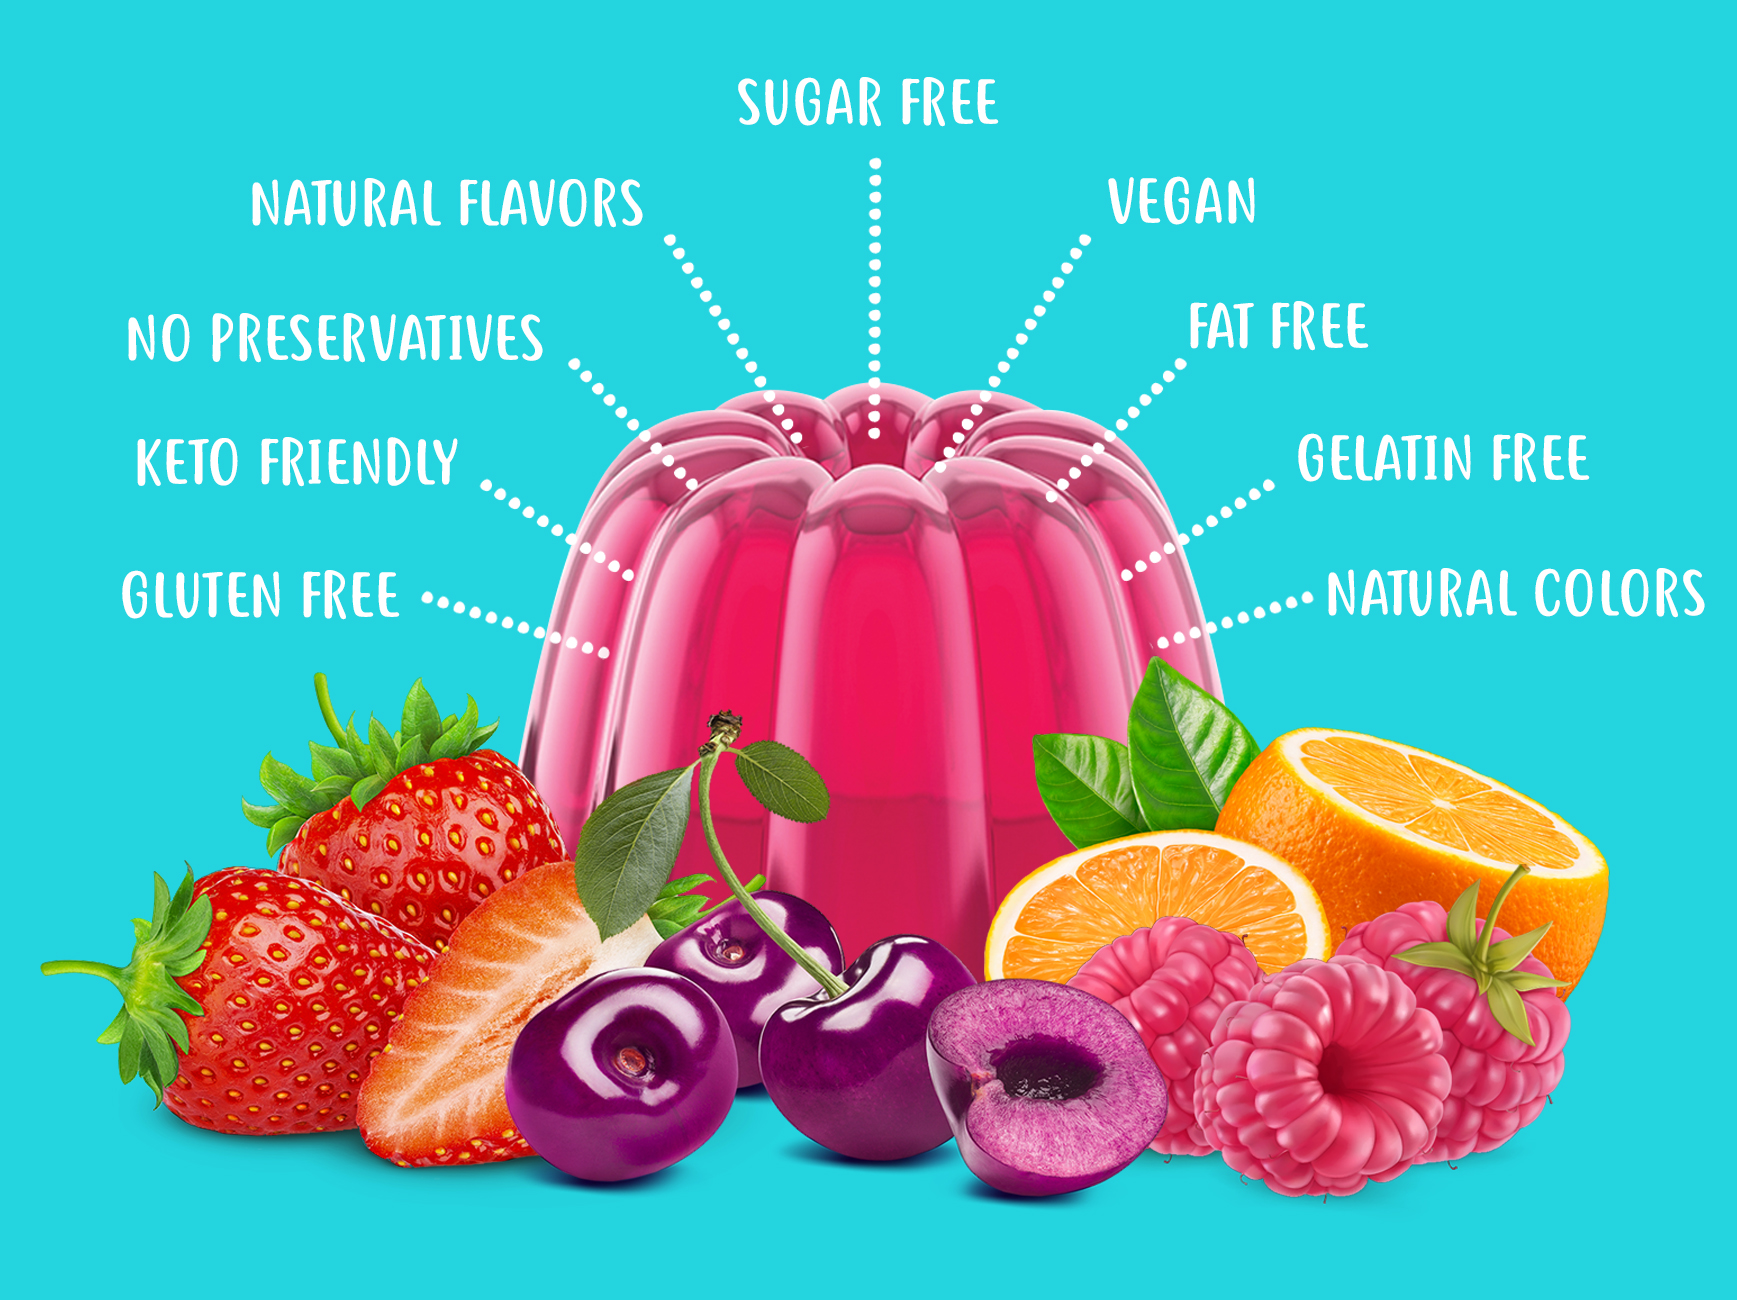 Gluten Free, Keto Friendly, No Preservatives, Natural Flavors, Natural Colors, Sugar Free, Vegan, Fat Free, Gelatin Free